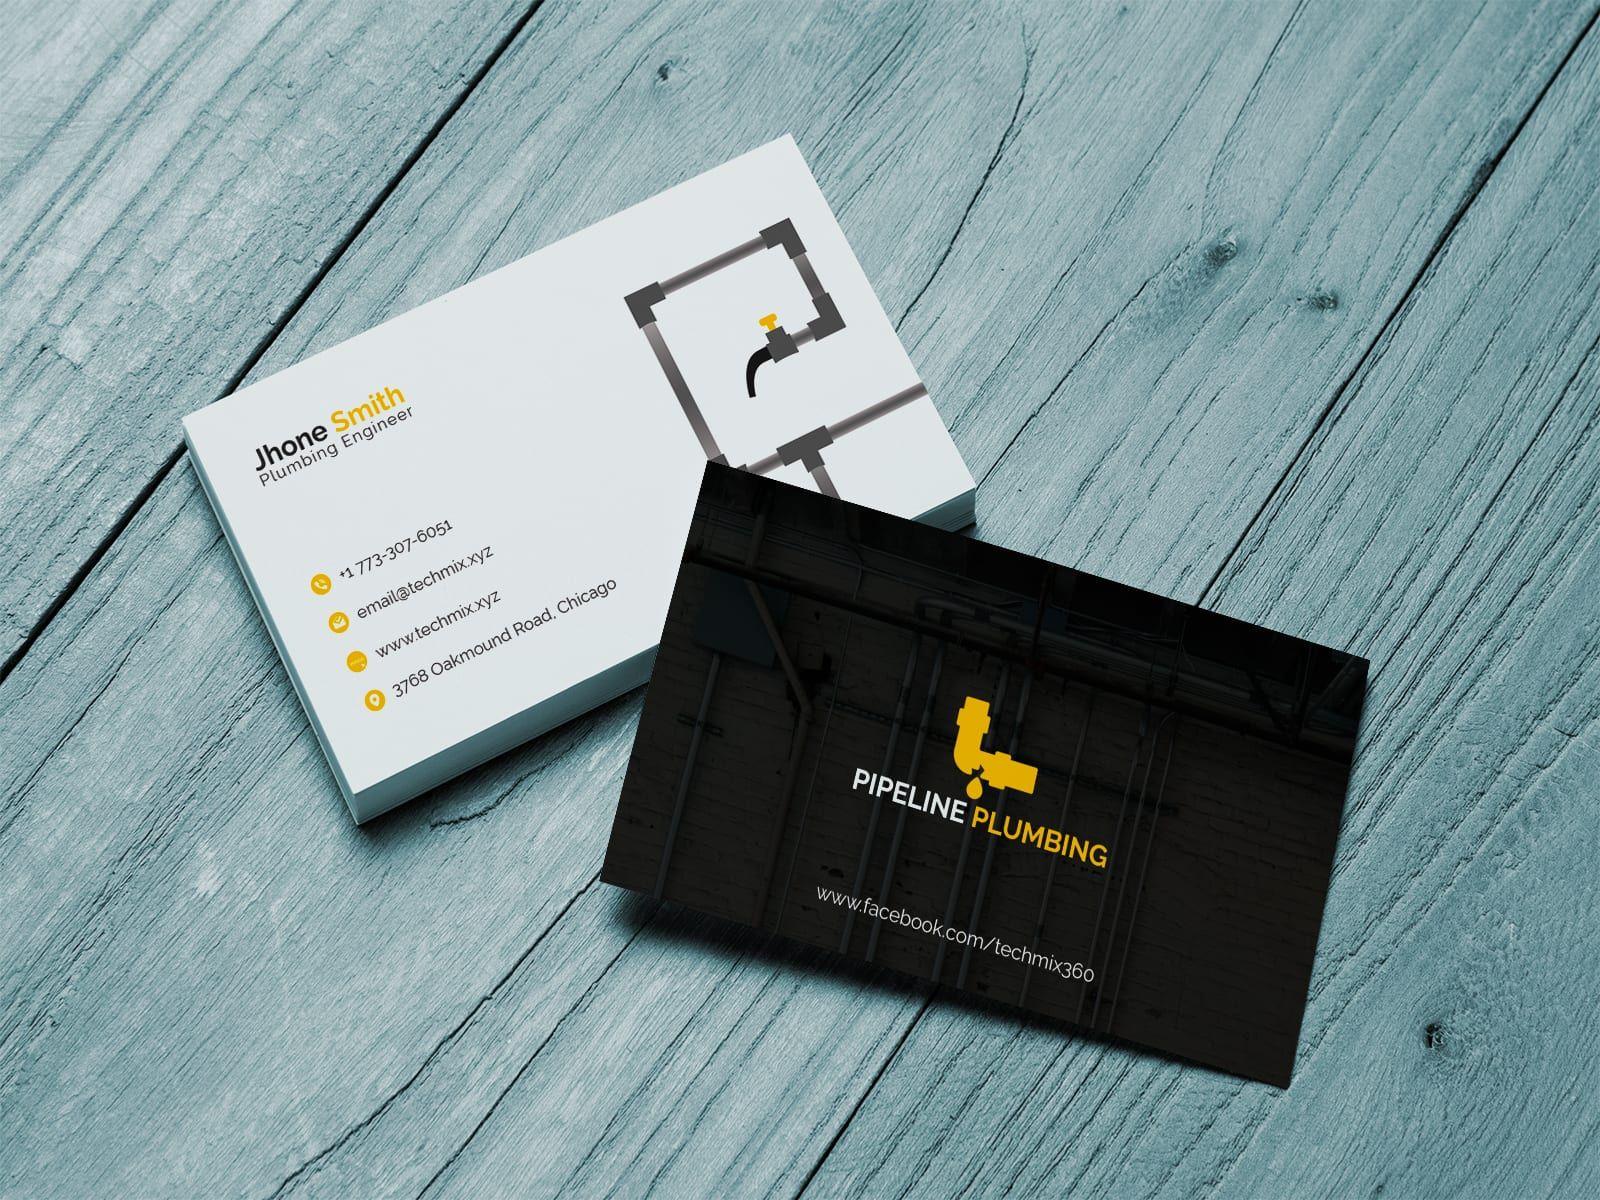 Plumbing Business Cards Template Business Cards Collection Business Cards Creative Business Card Design Creative